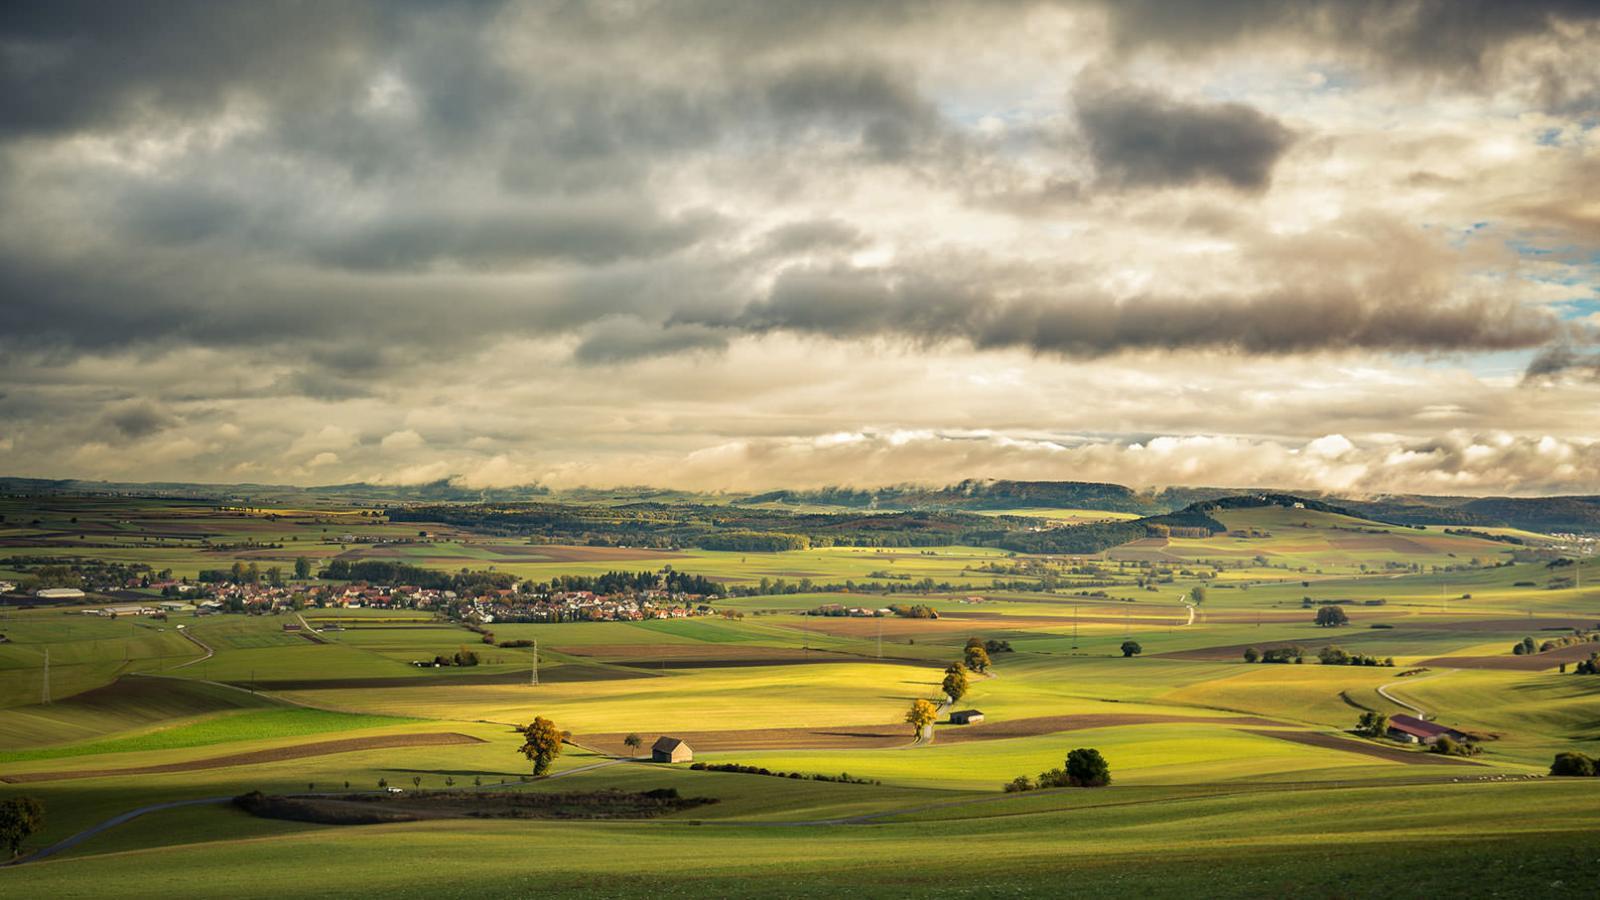 Herbst-Fotografie, Fotoshooting Feld mit Himmel